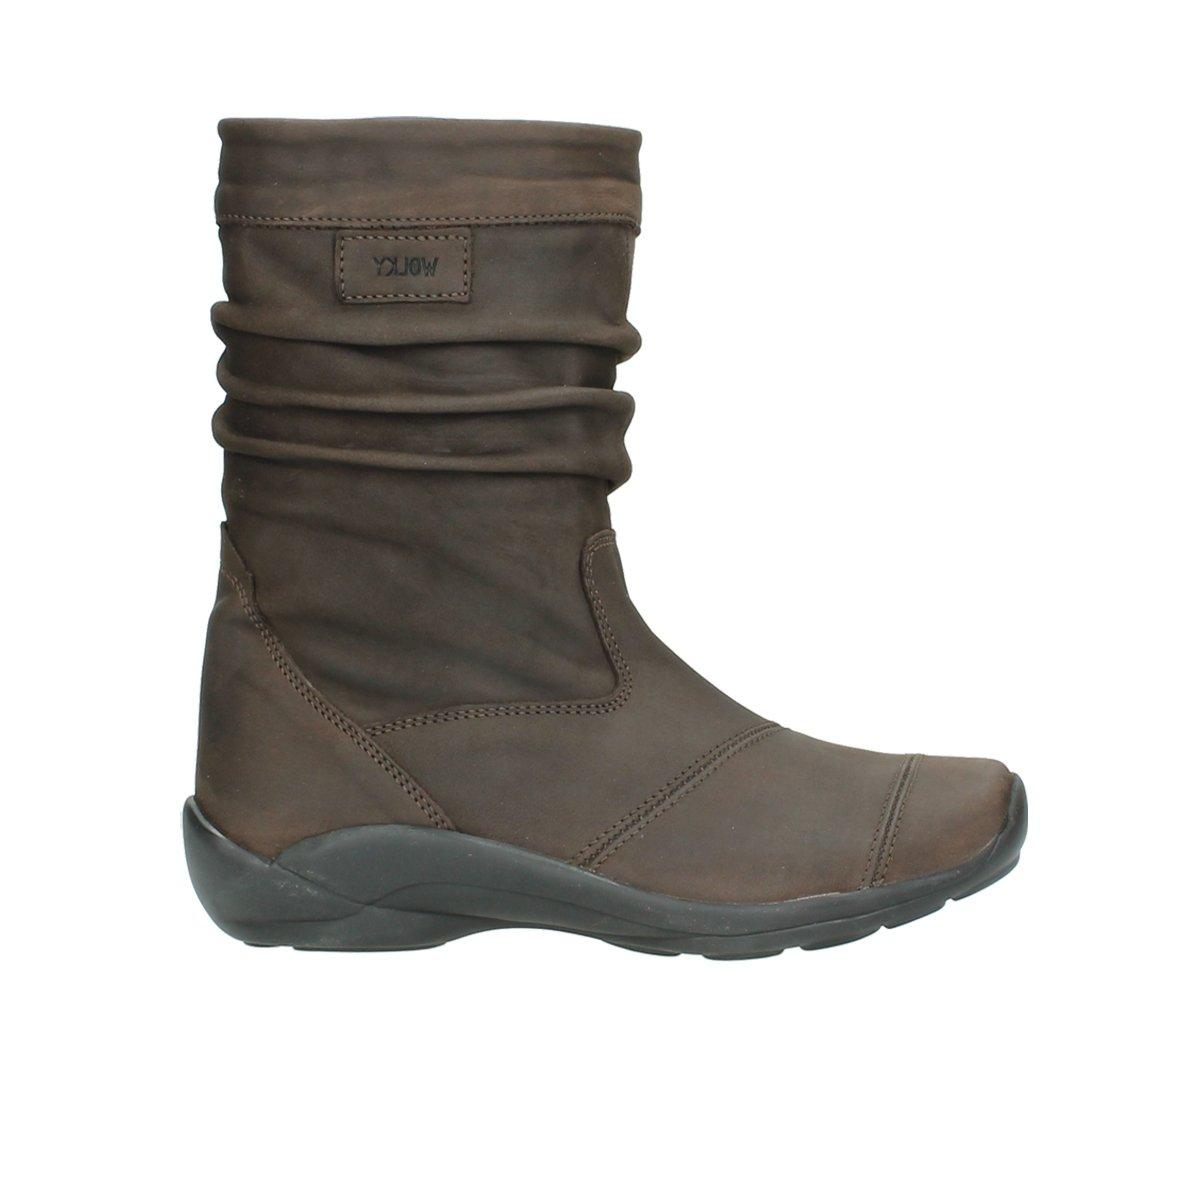 Wolky 1678 Jacky WP - Botas para mujer42 UE|Marrón - 530 braun ge枚ltes Leder / Water Proof Warmfutter